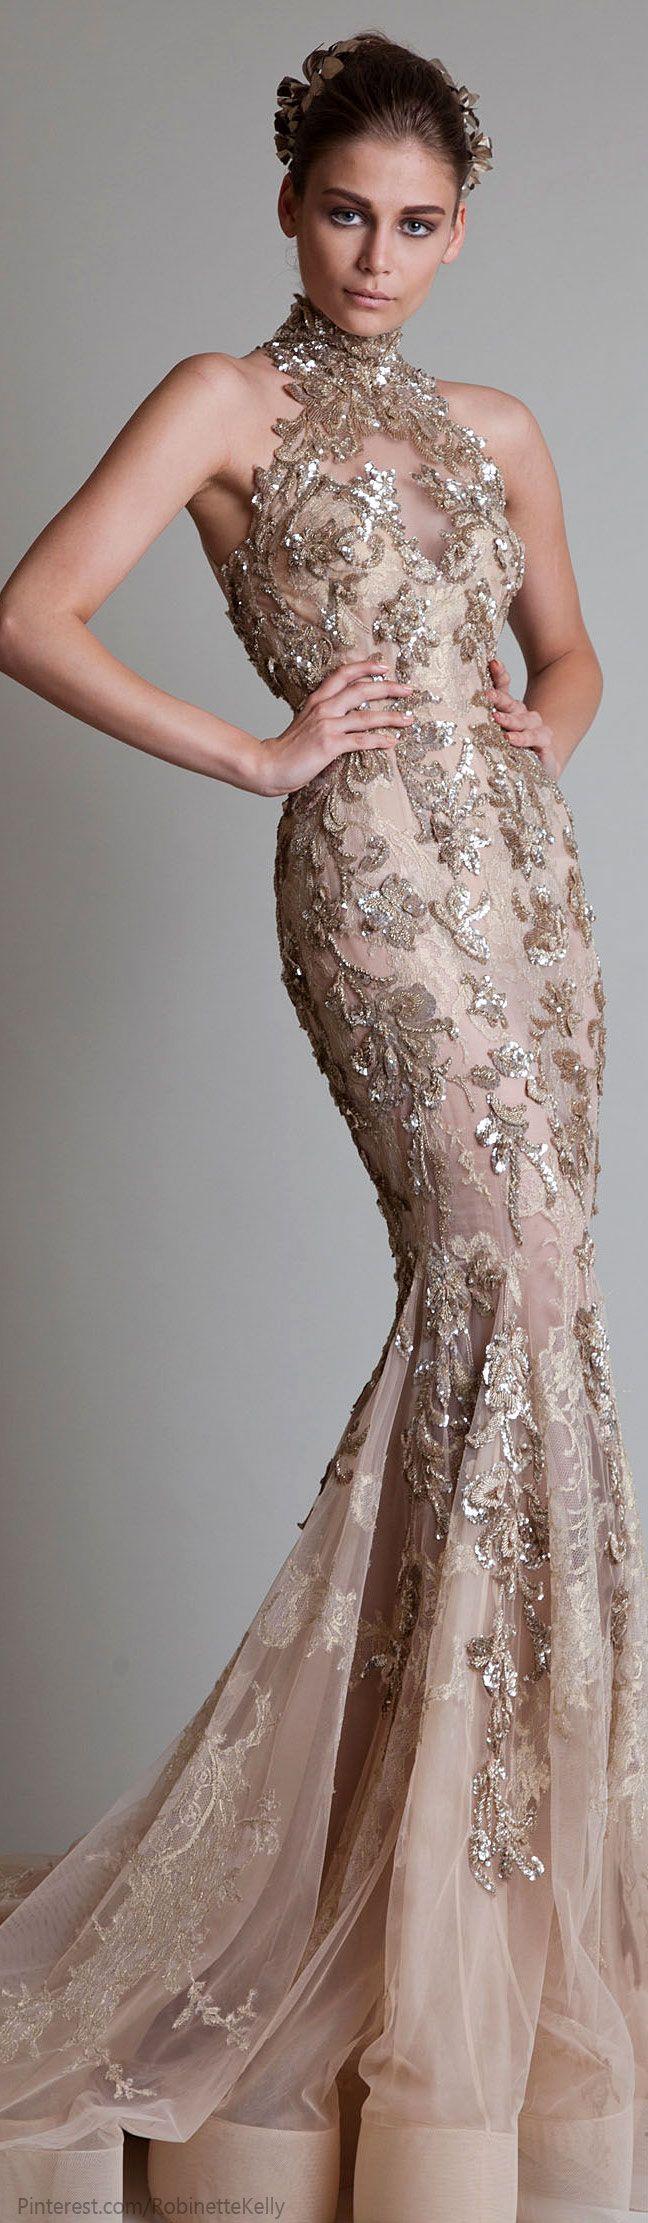 абитуриентска-дизайнерска-рокля-127